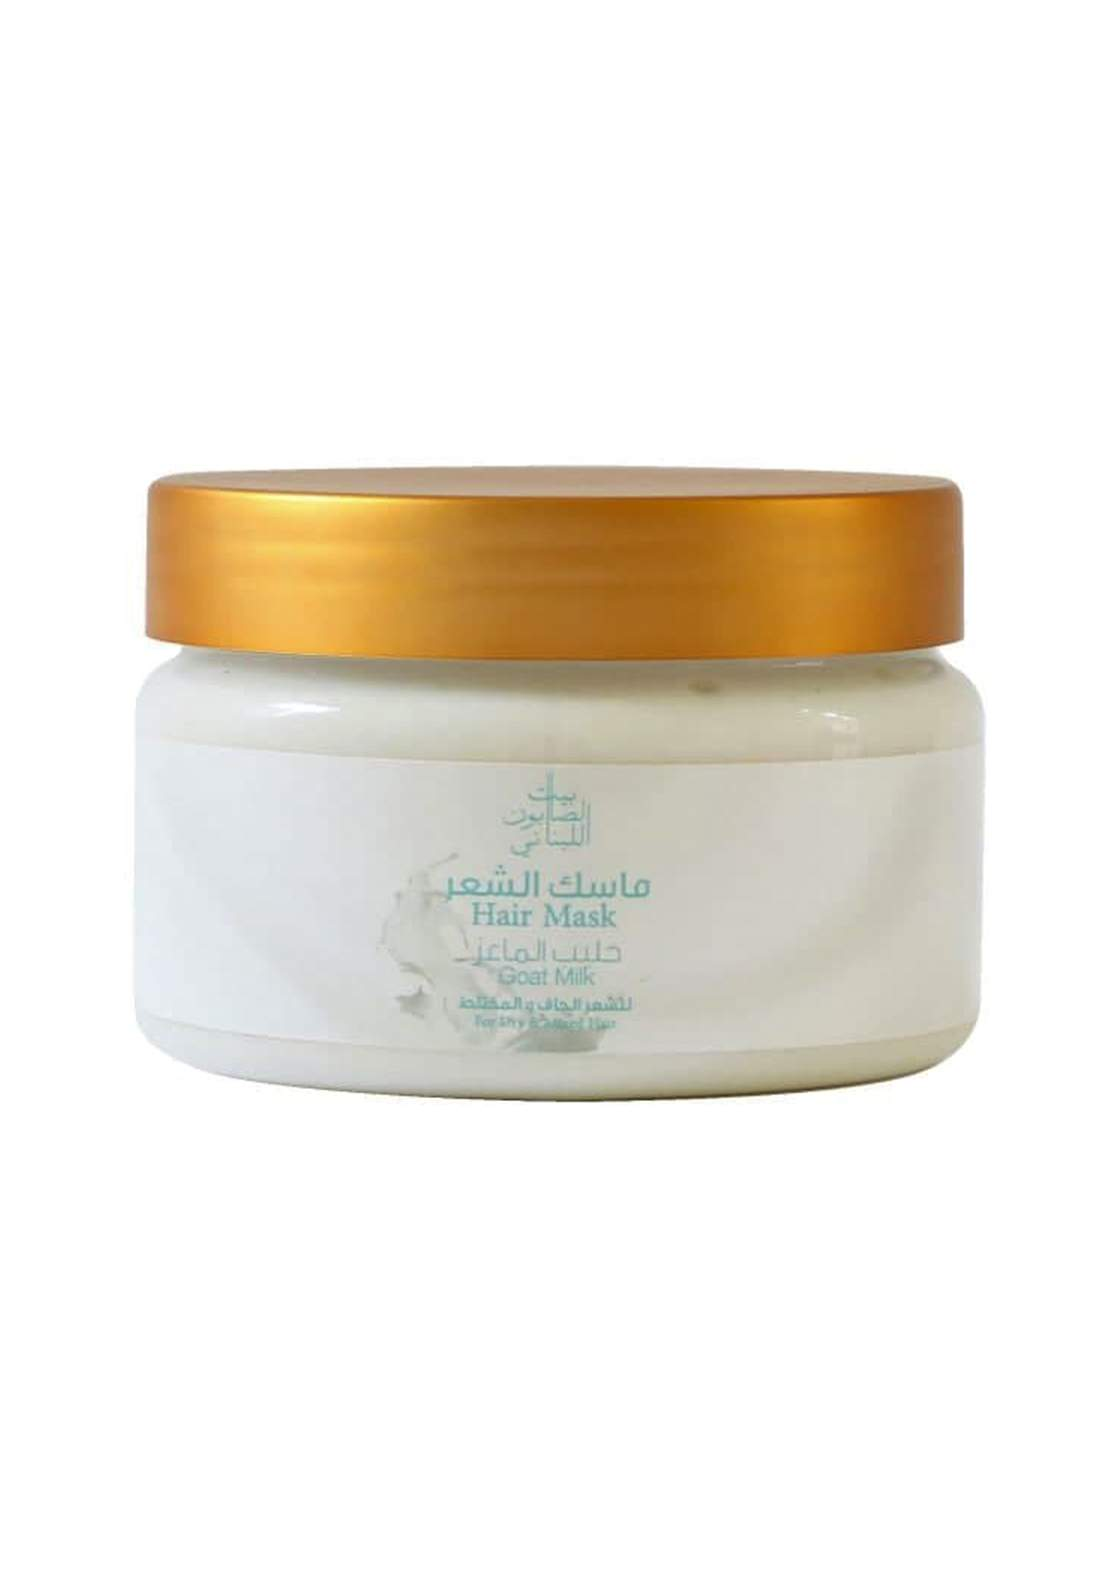 Bayt Alsaboun Alloubnani-317481 Hair Mask Goat Milk 300g ماسك للشعر